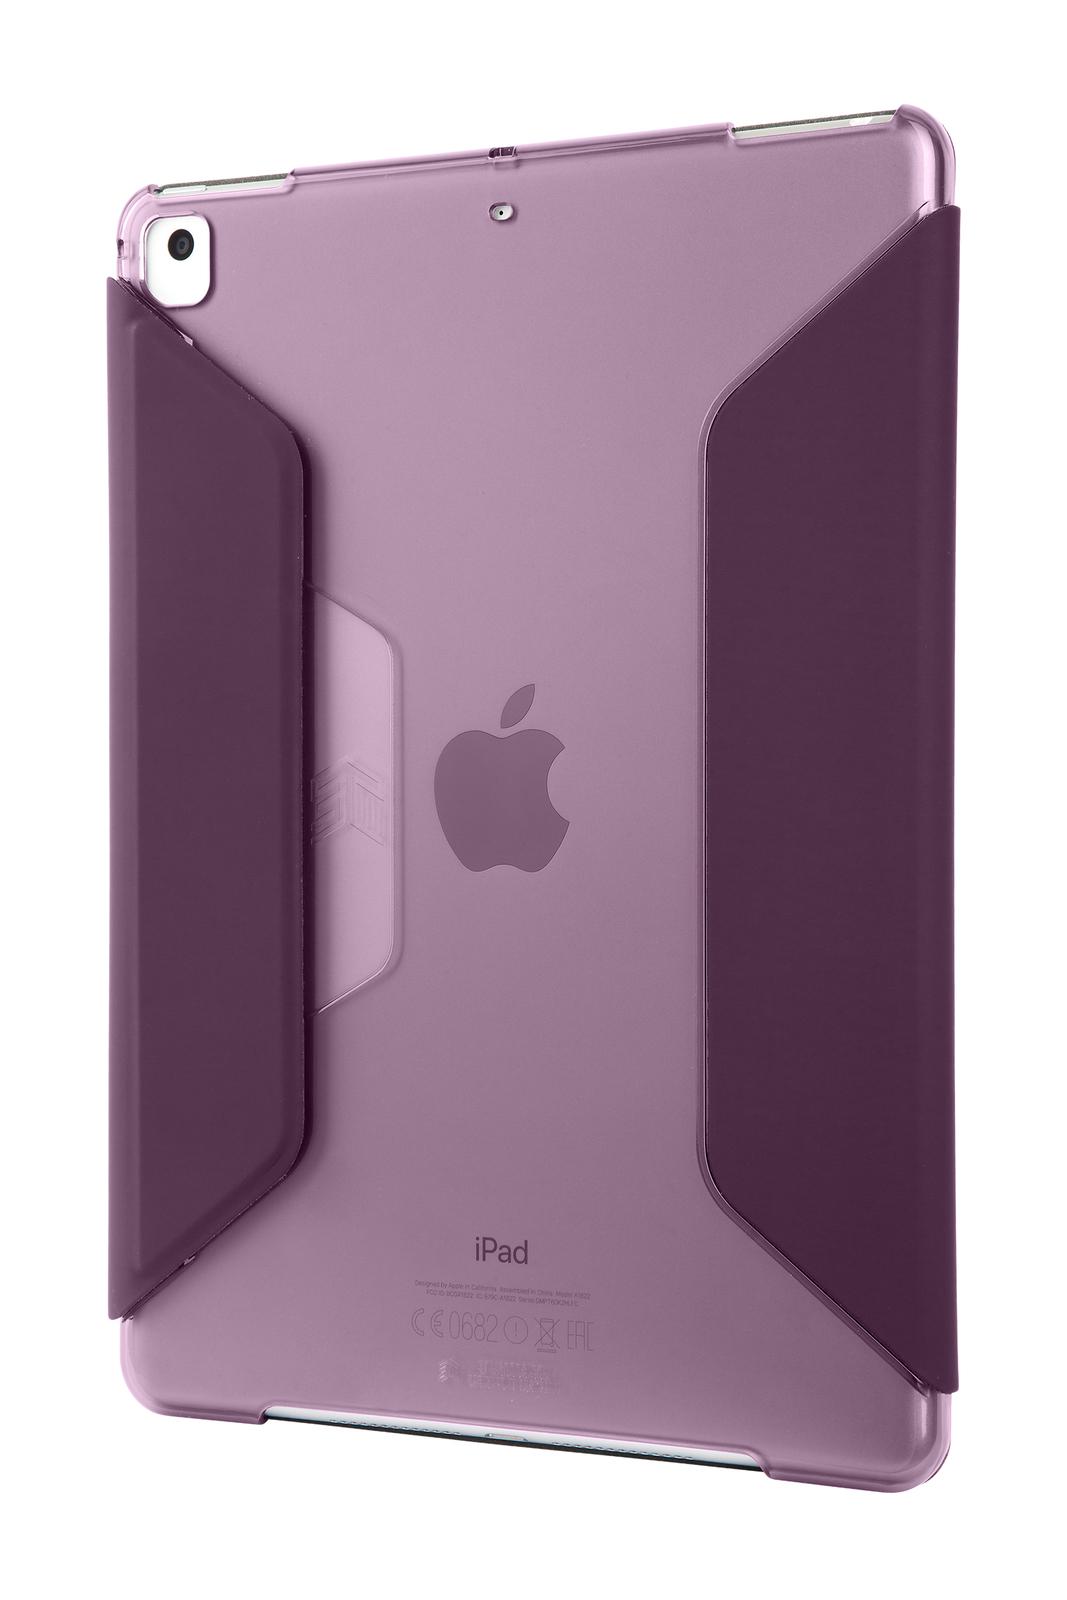 STM Studio for iPad 5th gen/Pro 9.7/Air 1-2 - Dark Purple image